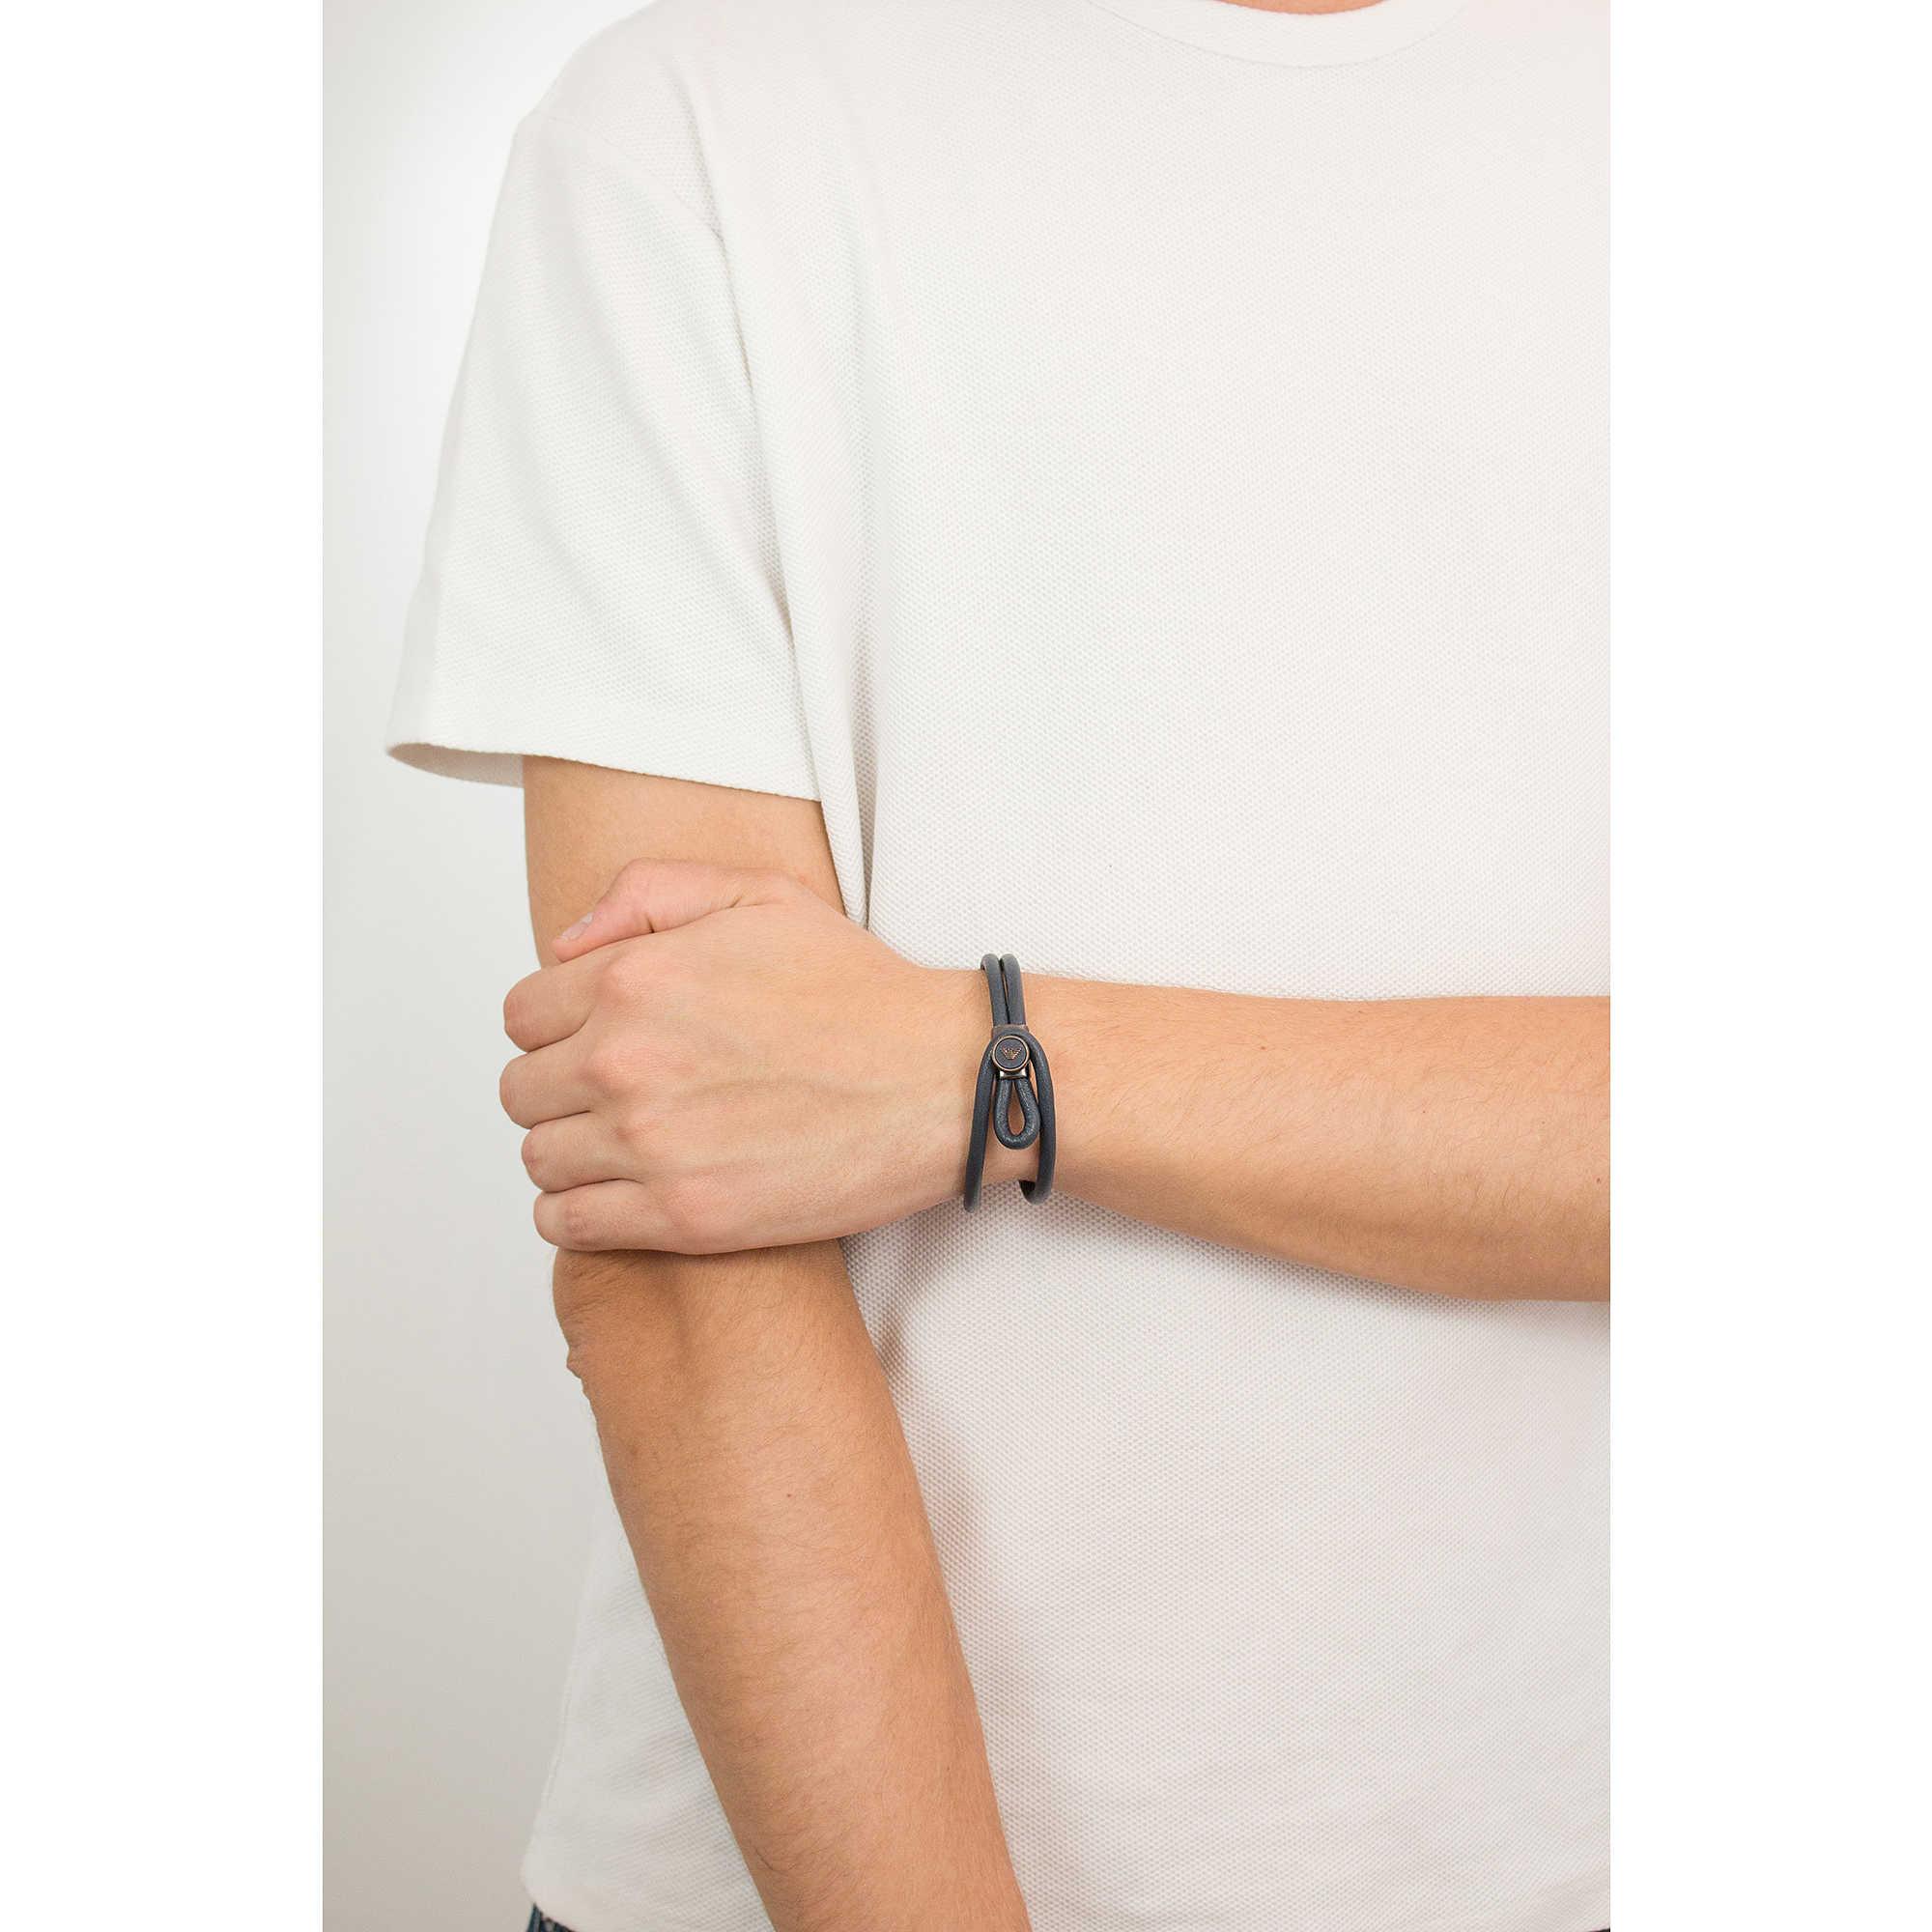 bracelet man jewellery Emporio Armani EGS2214020. zoom. Emporio Armani  bracelets man EGS2214020 photo wearing. zoom 2f724d4363e